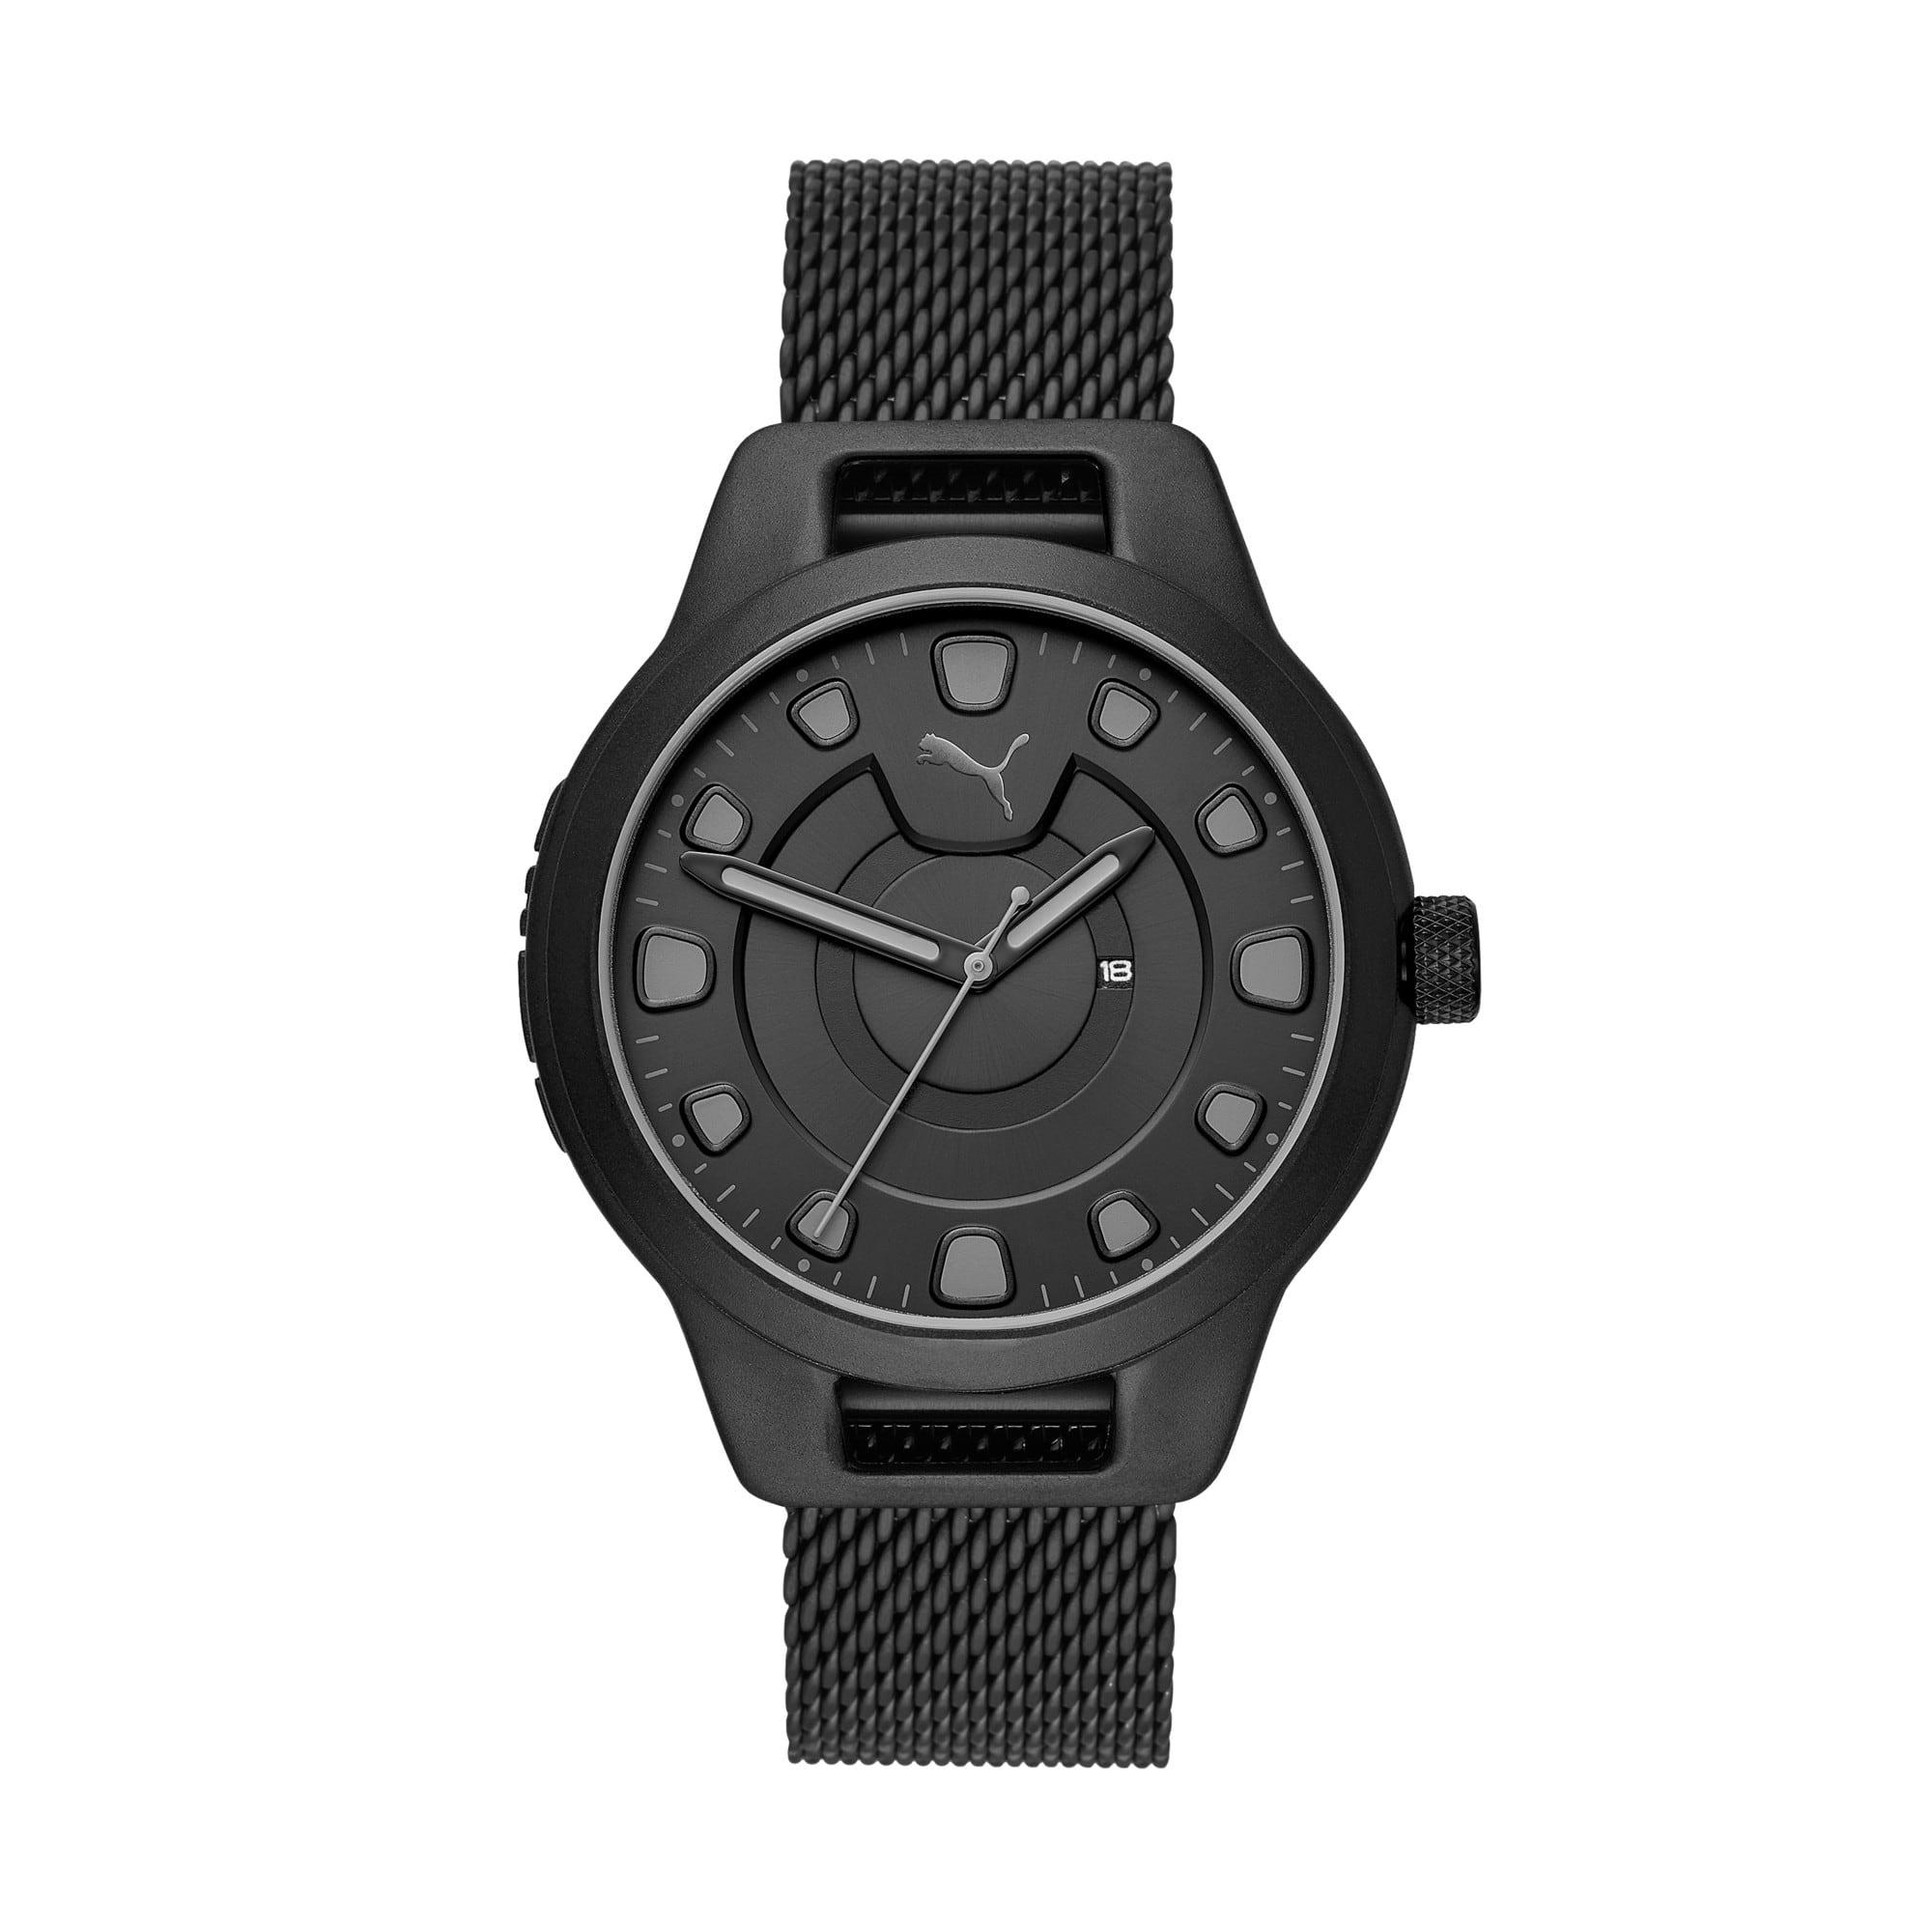 Thumbnail 1 of Reset v1 Watch, Black/Black, medium